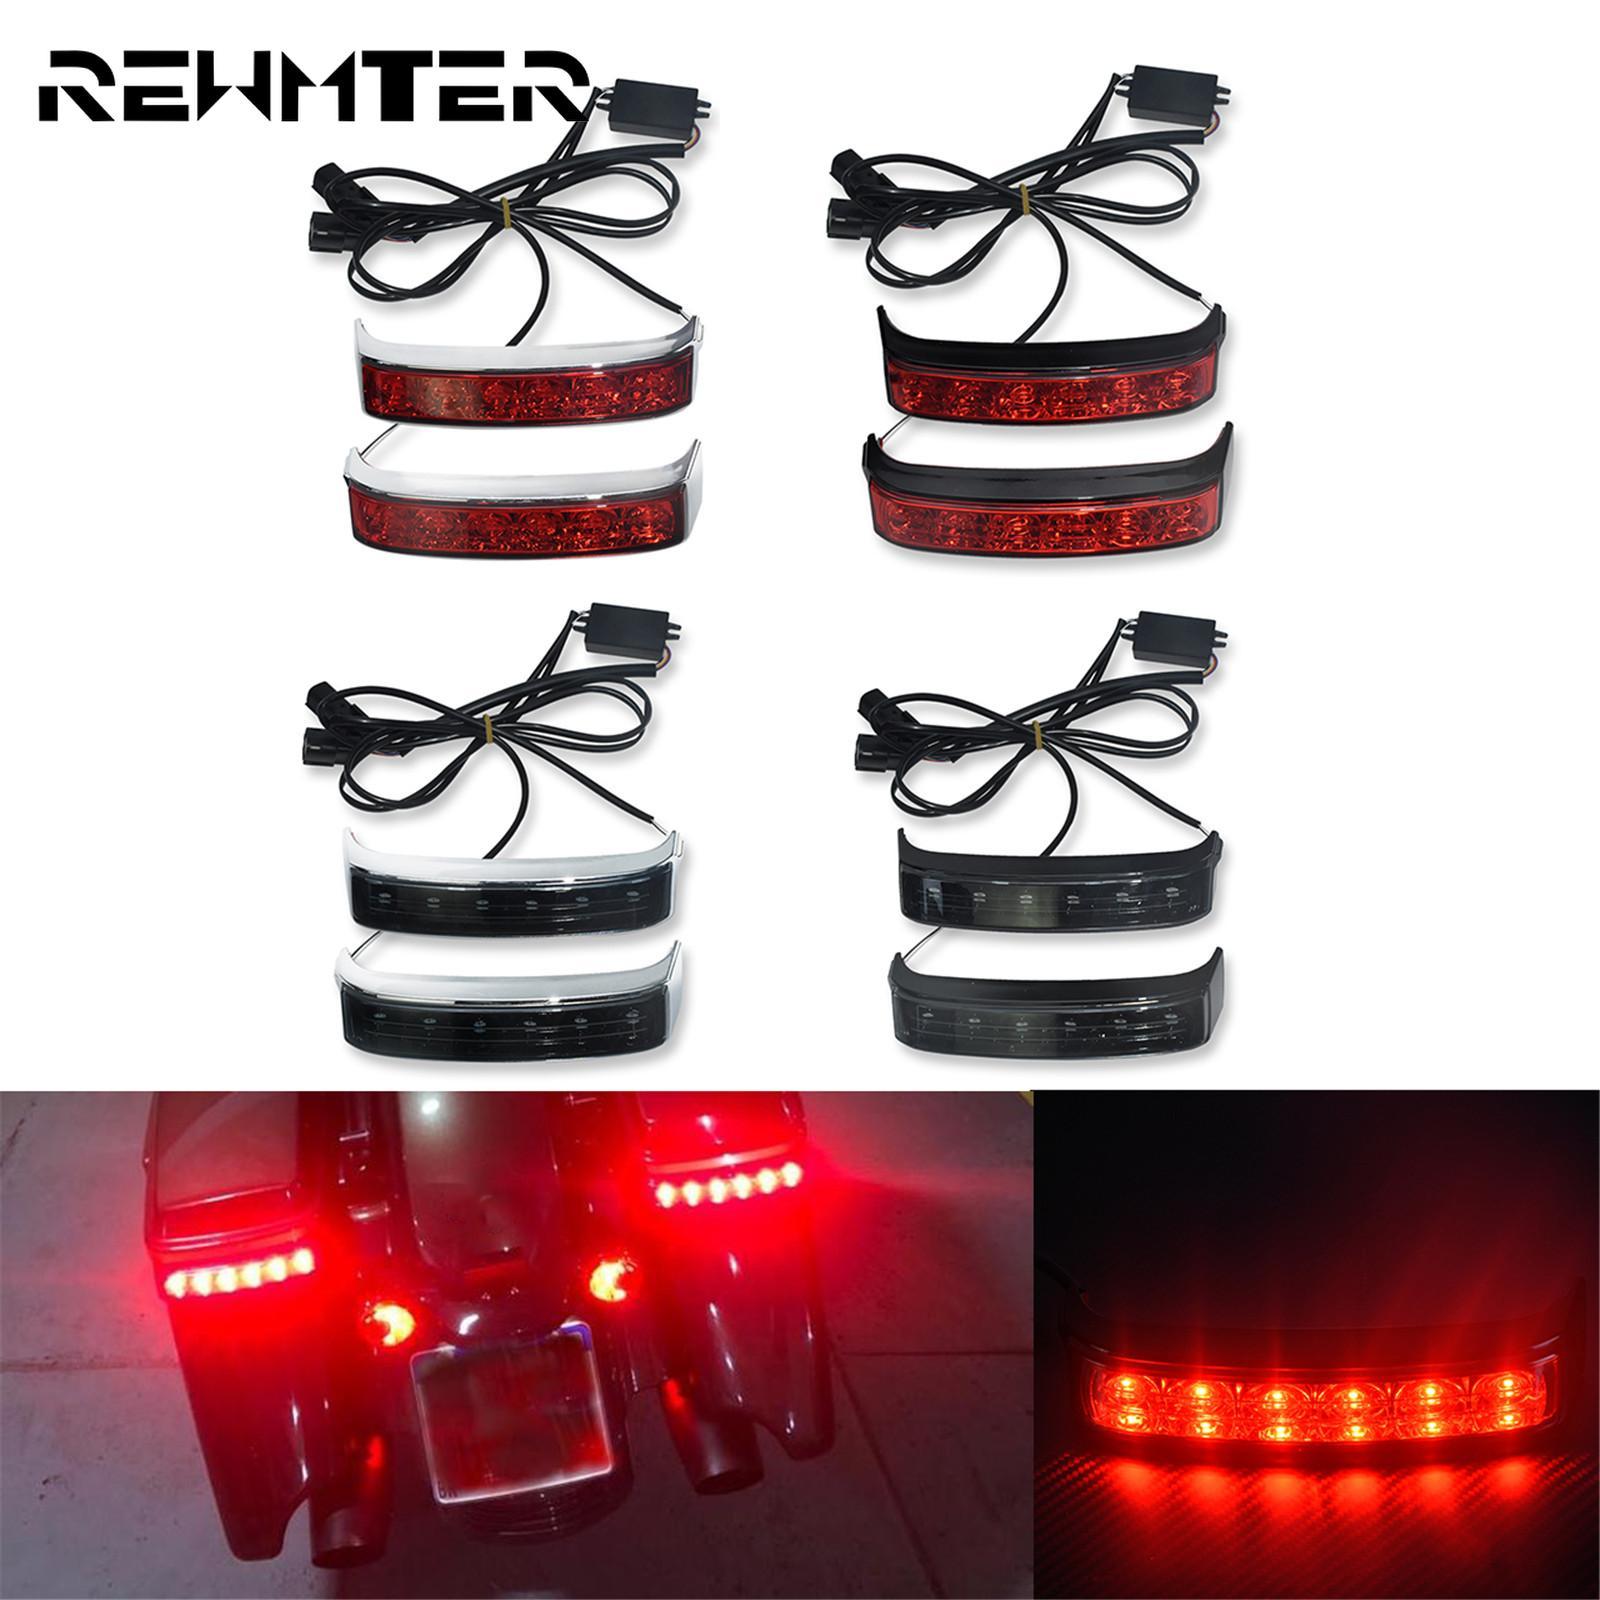 Motorcycle LED Saddlebag Run Brake Turn Signal Light Black/Chrome Housing Smoke Red Lens Lamp For Harley Touring Road King 14-20